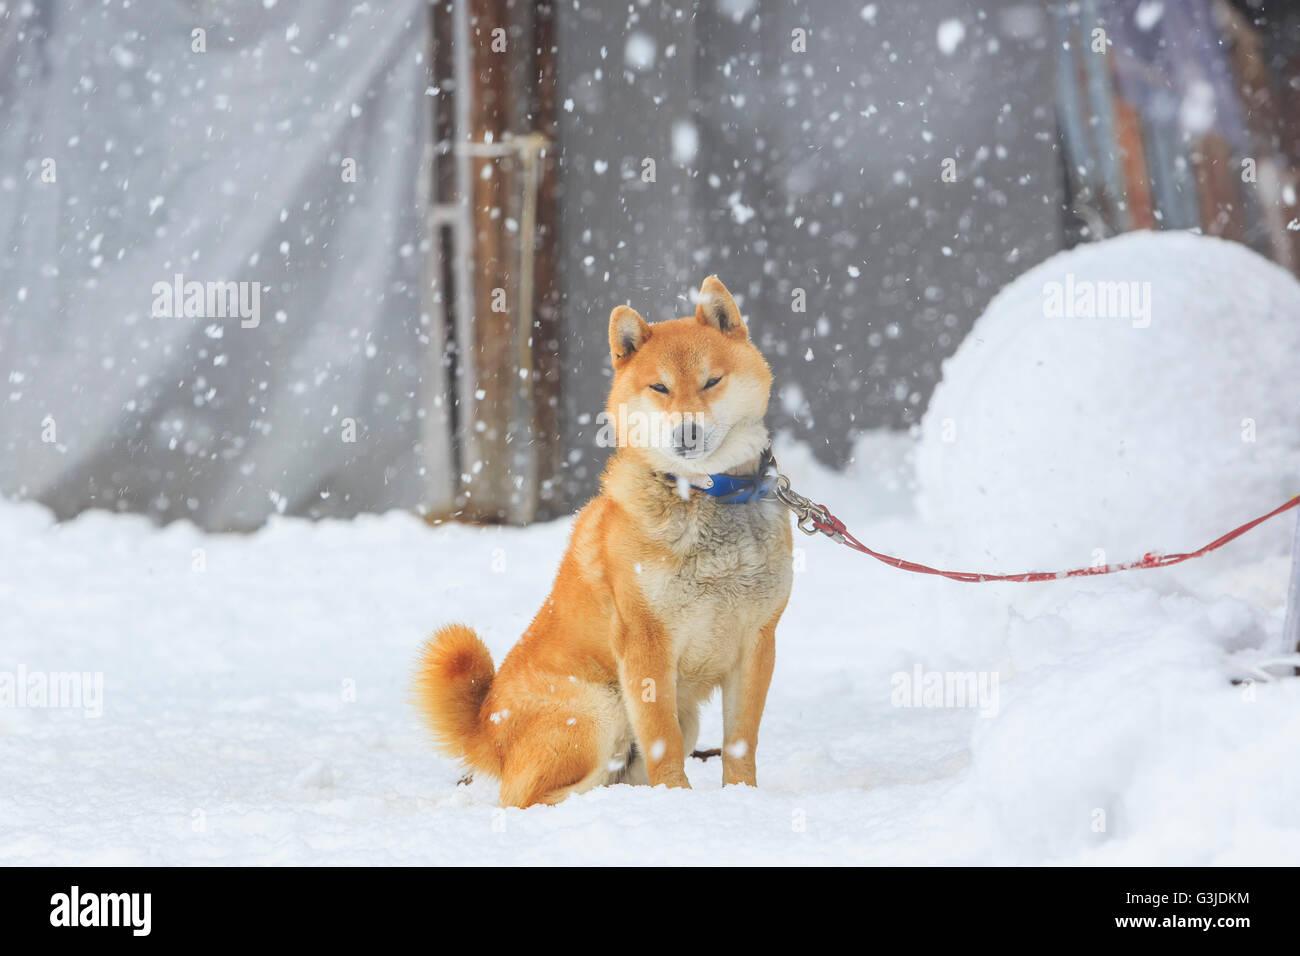 Dog sleeping at Historic Villages of Shirakawa-go in a snowy day - Stock Image